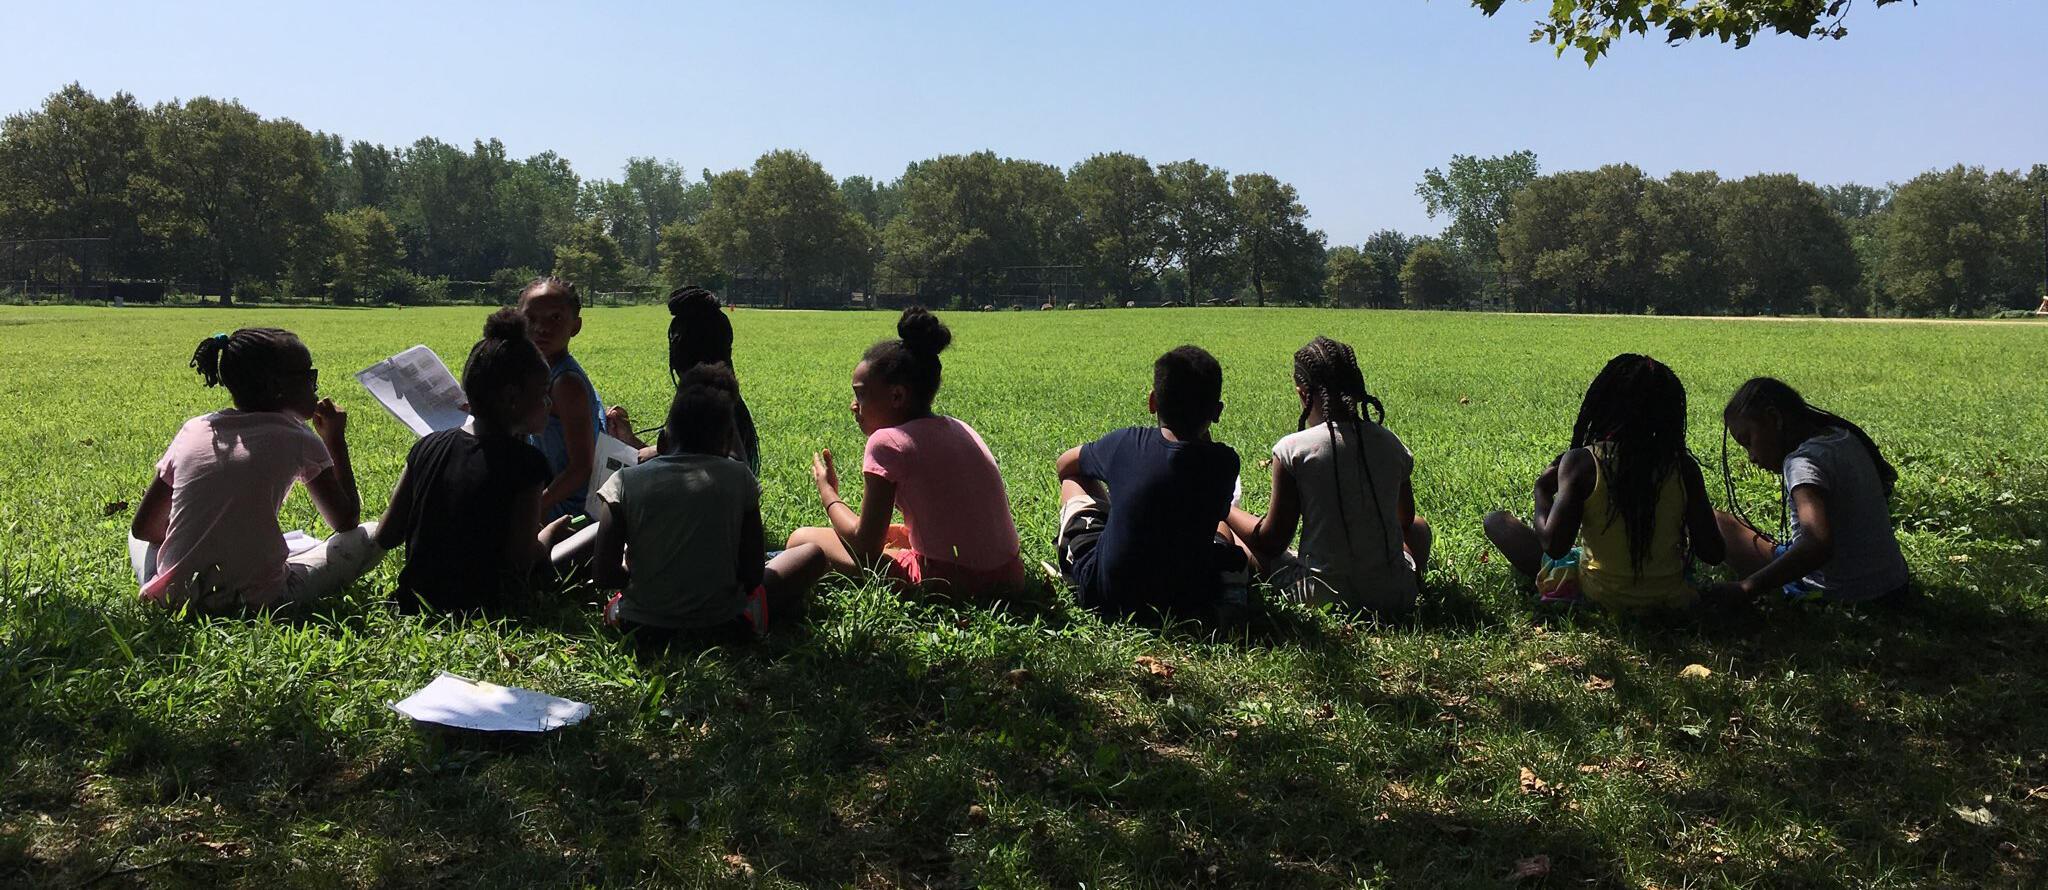 NYC Youth Education Programs. Photo: Audubon New York